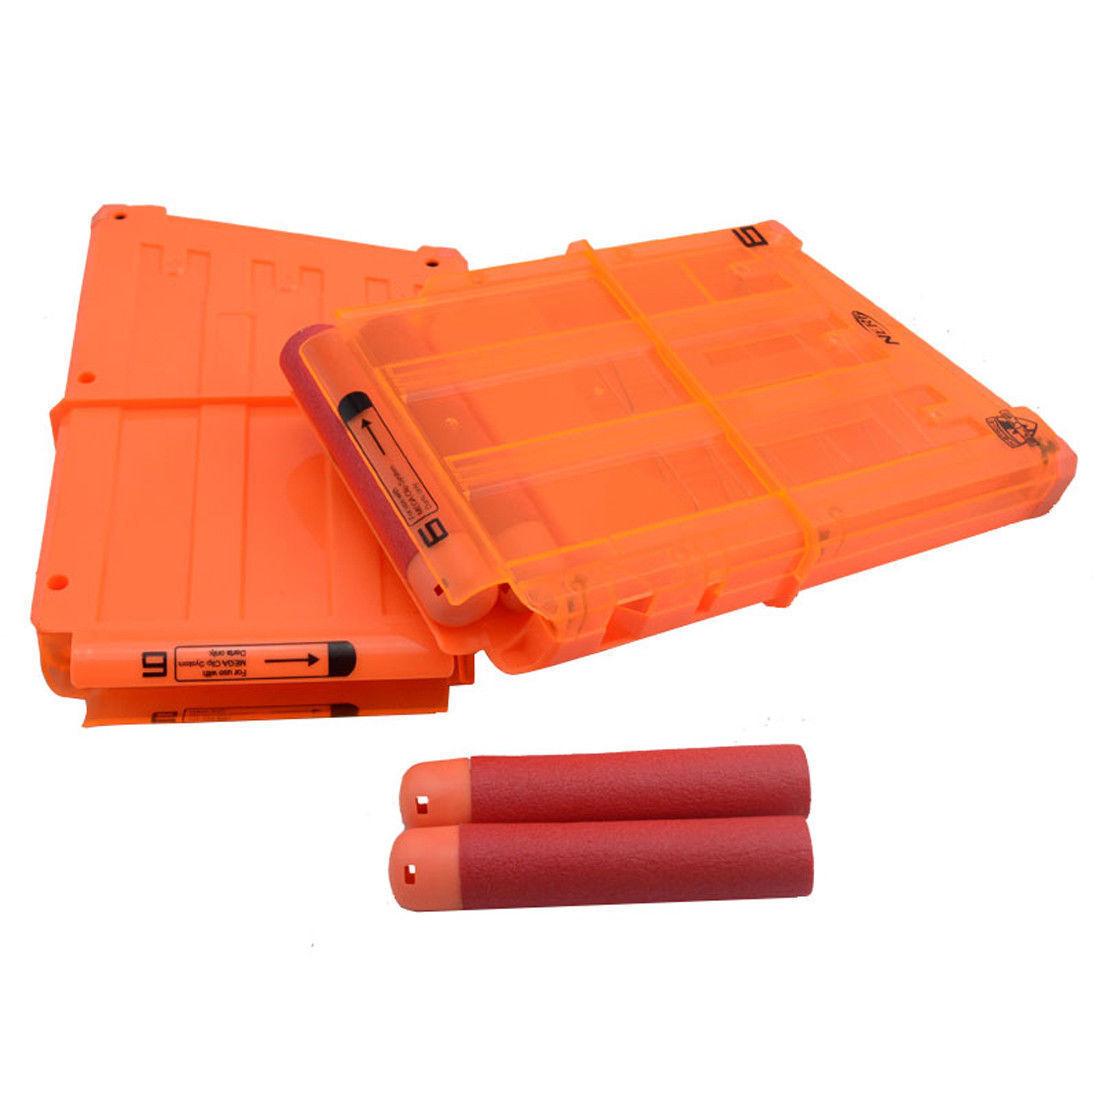 2PCS Ammo Ammo Ammo Magazine Clip Replacement for Nerf N-Strike Mega Centurion Blaster e67e9c